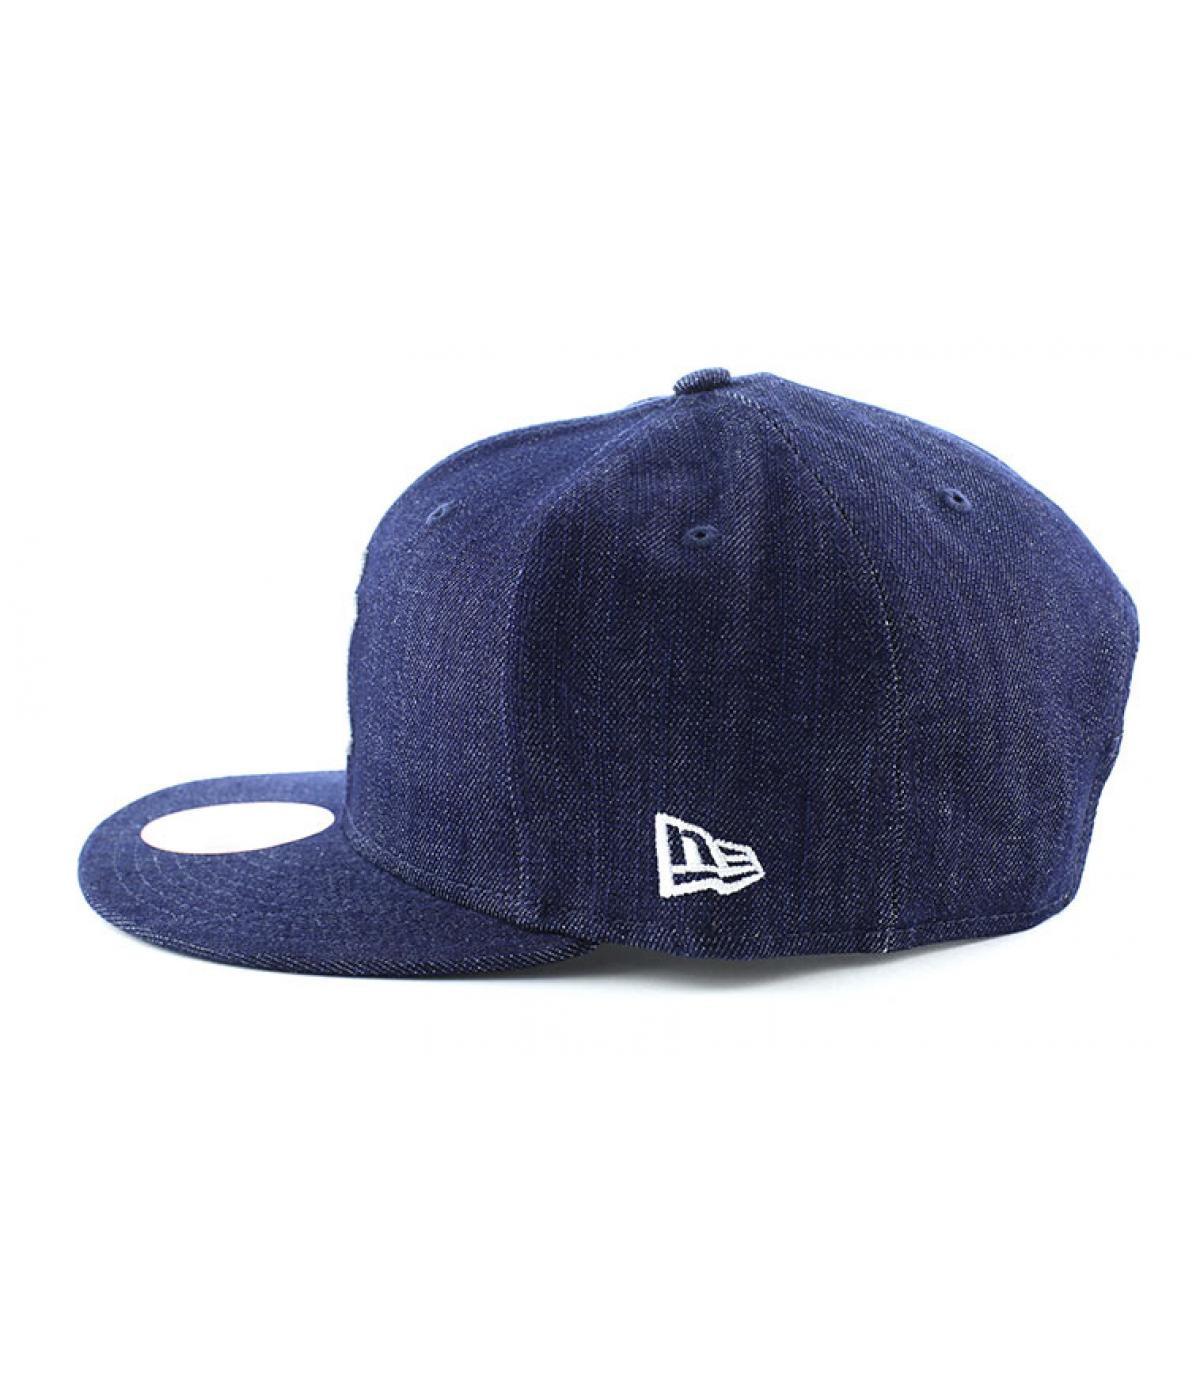 Details Snapback Cap NY MLB denim basic - Abbildung 4